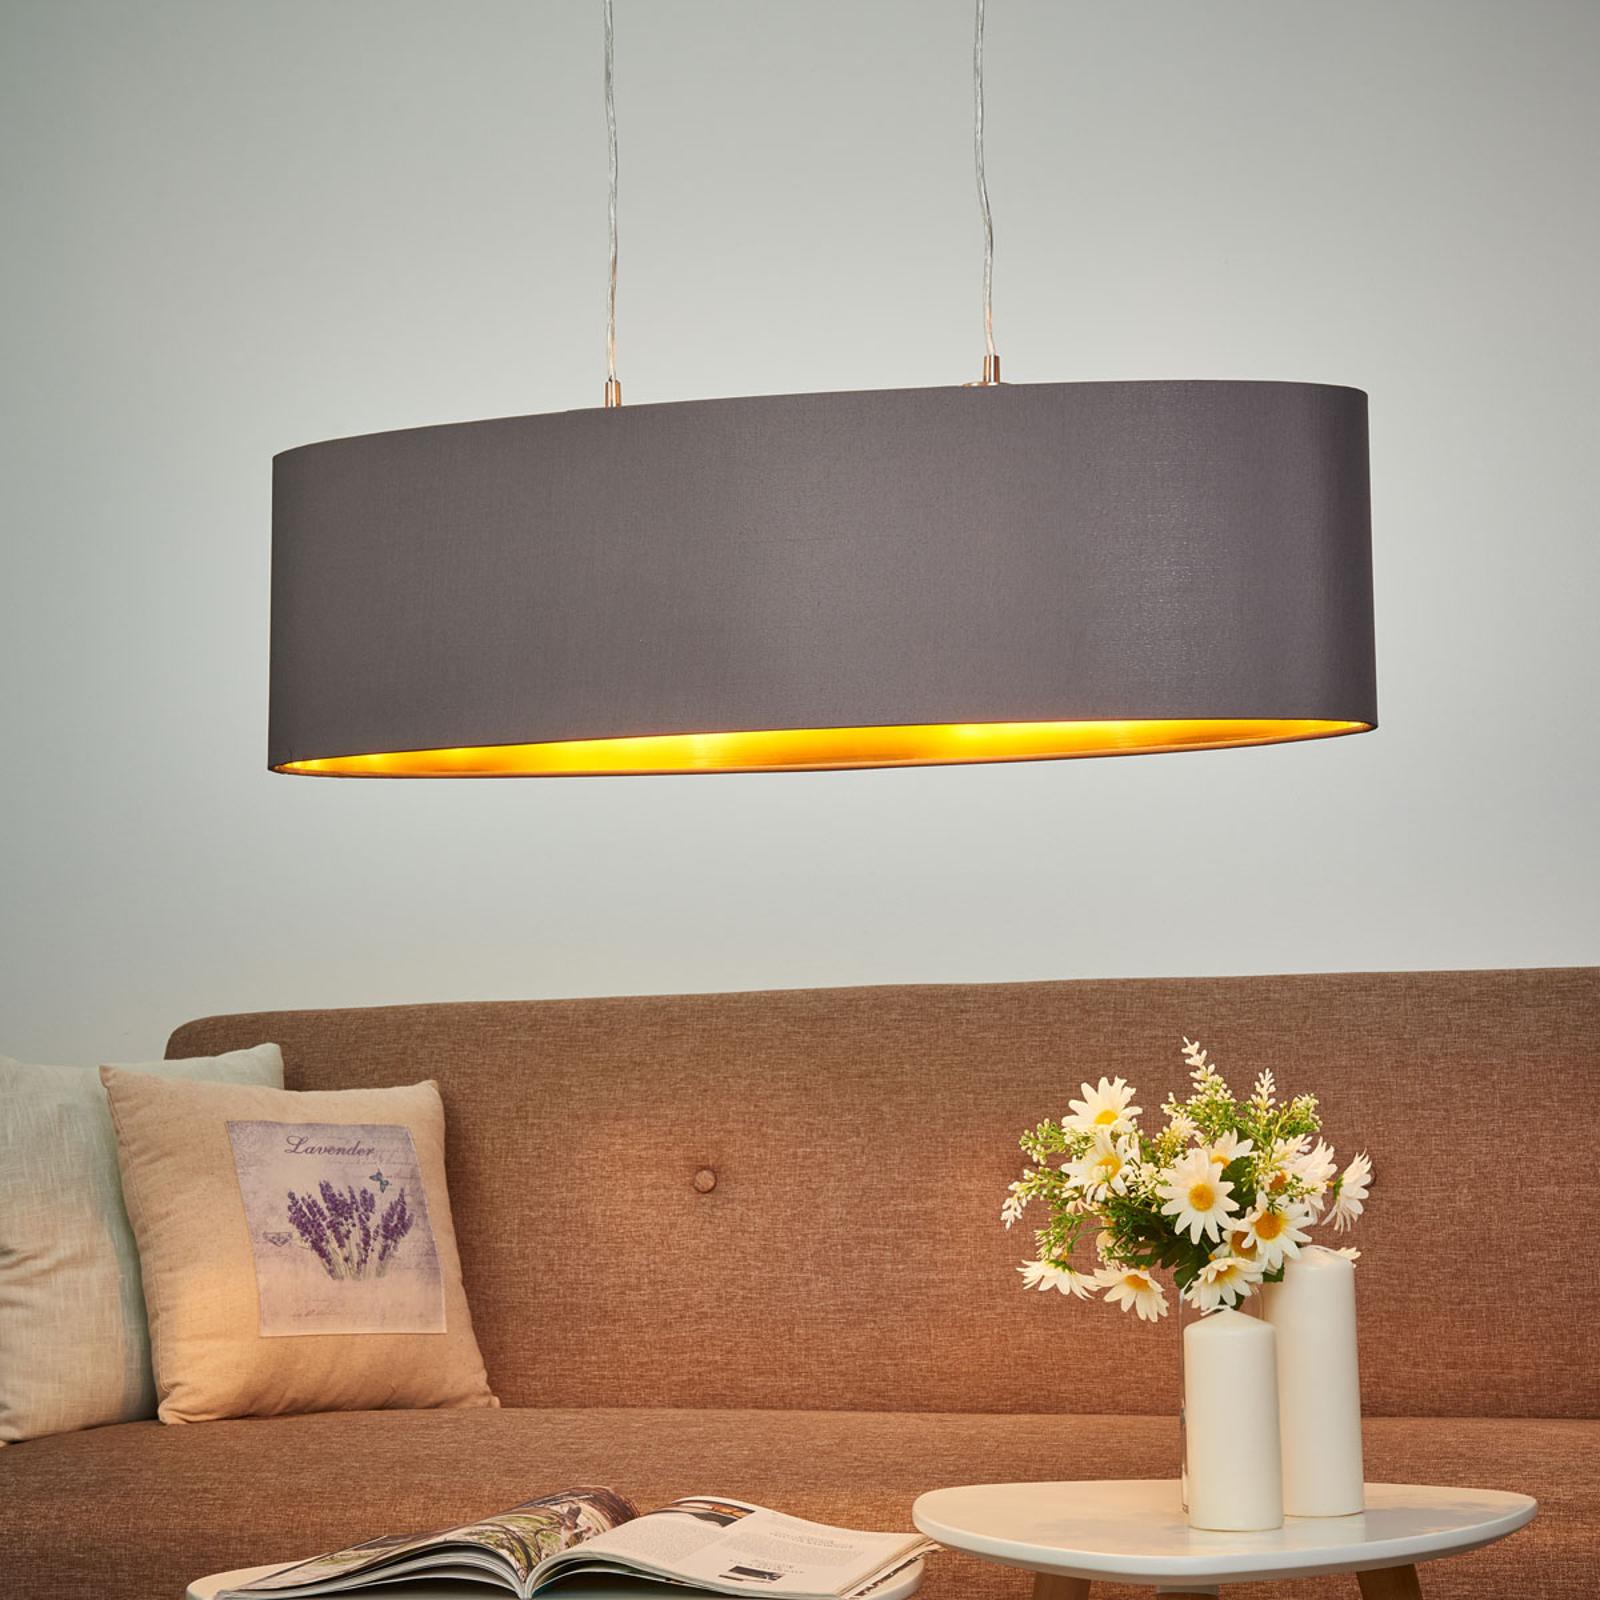 Lampa wisząca z tkaniny Maserlo, cappuccino 78 cm